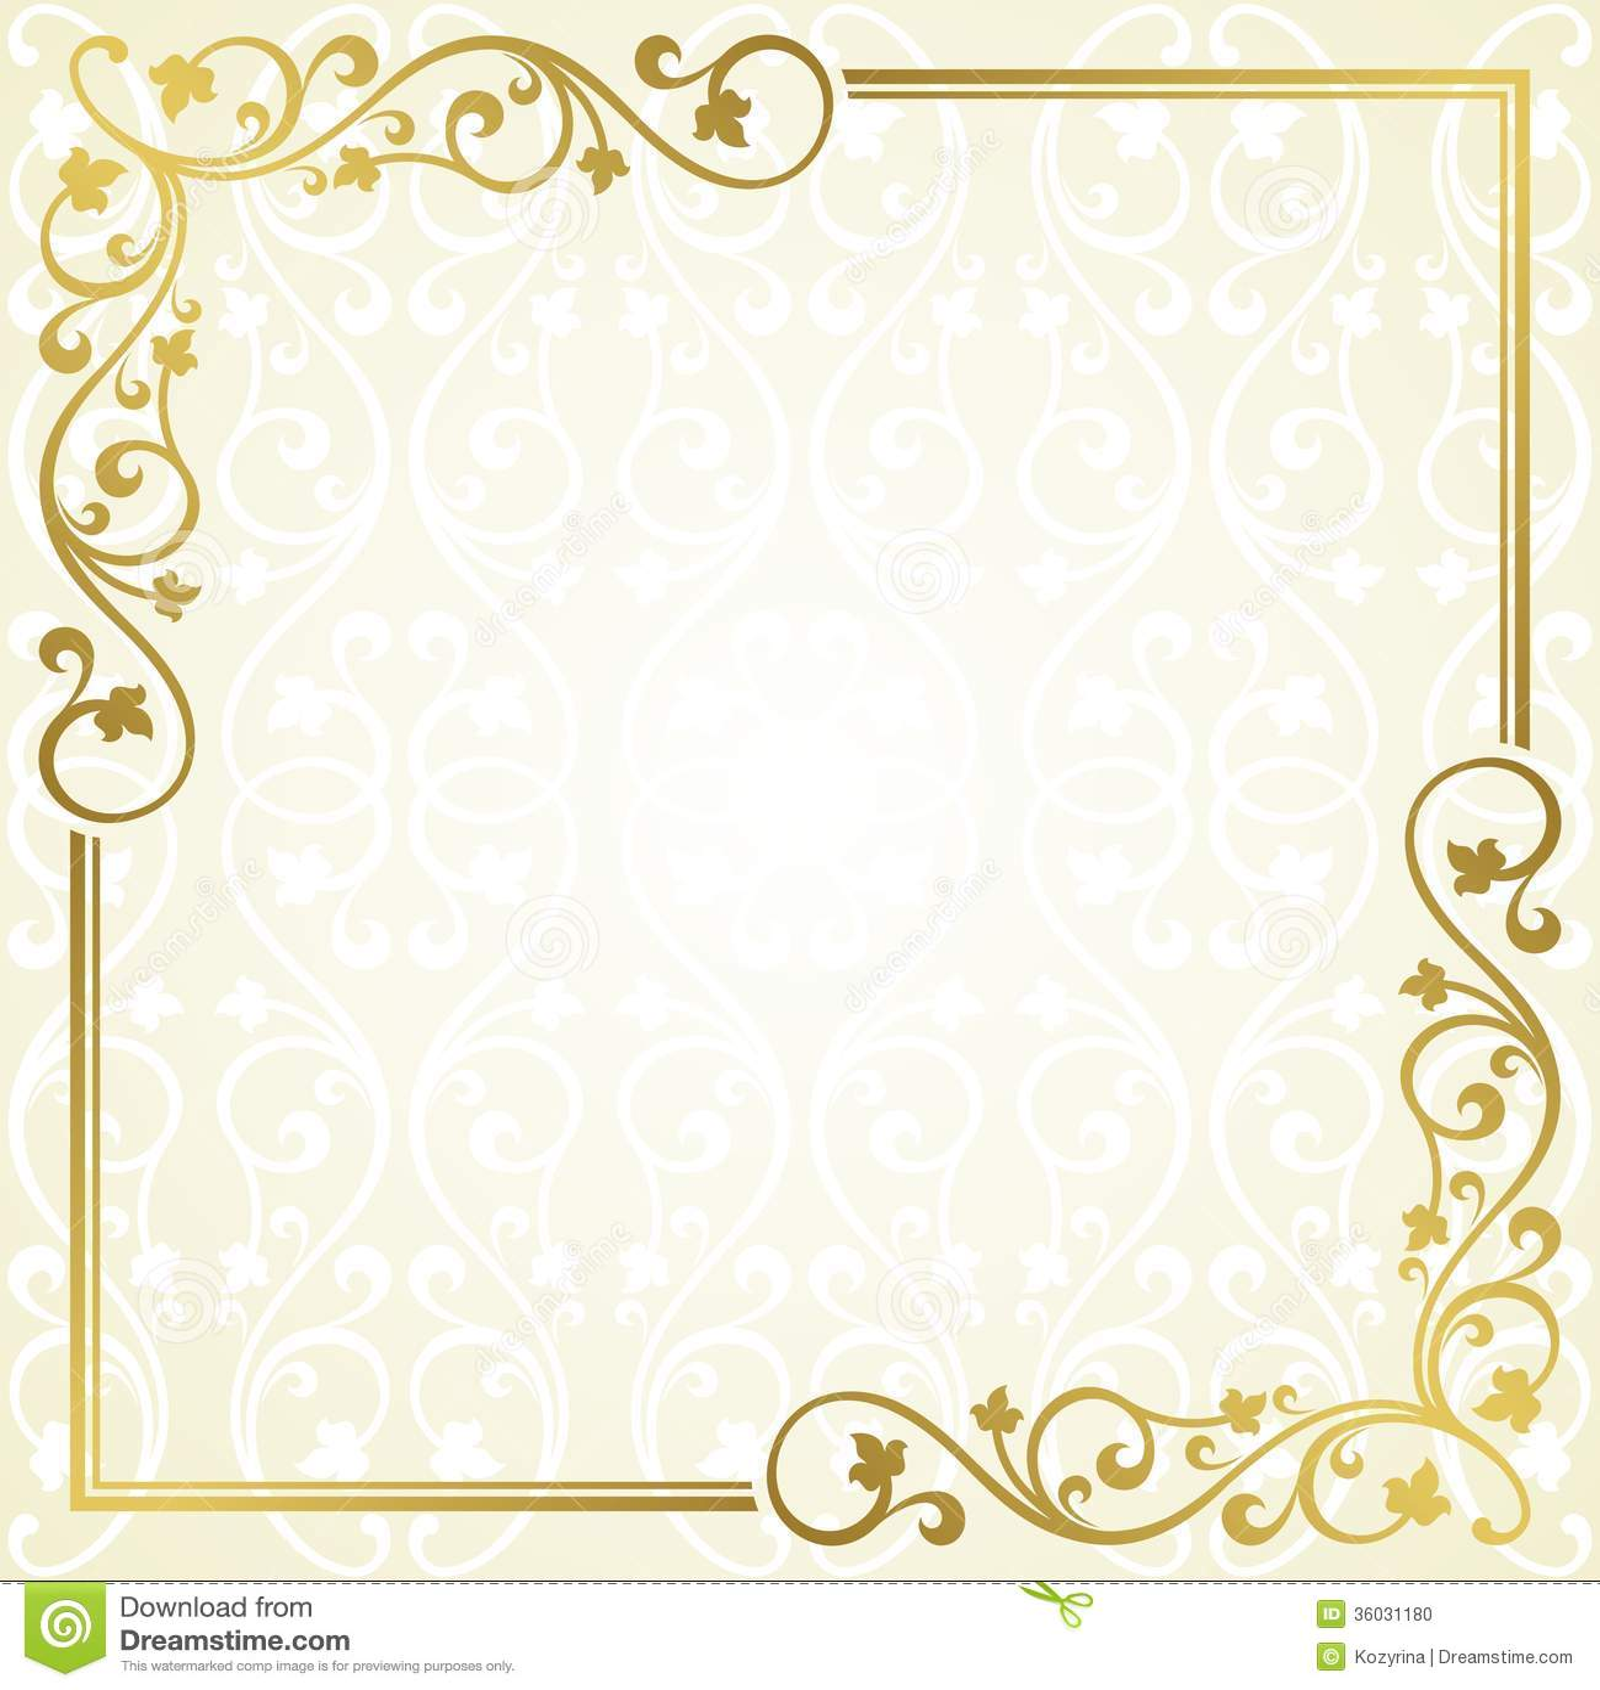 Simple And Warm Design Wedding Invitations Template: Ȋ�卉邀请卡片。 Ő�量例证. Ə�画 Ō�括有 ś�画, ɇ�子, ȣ�饰品, Ȯ�计, Ɗ�象, Ǻ�路, ɔ�定, ȃ�包